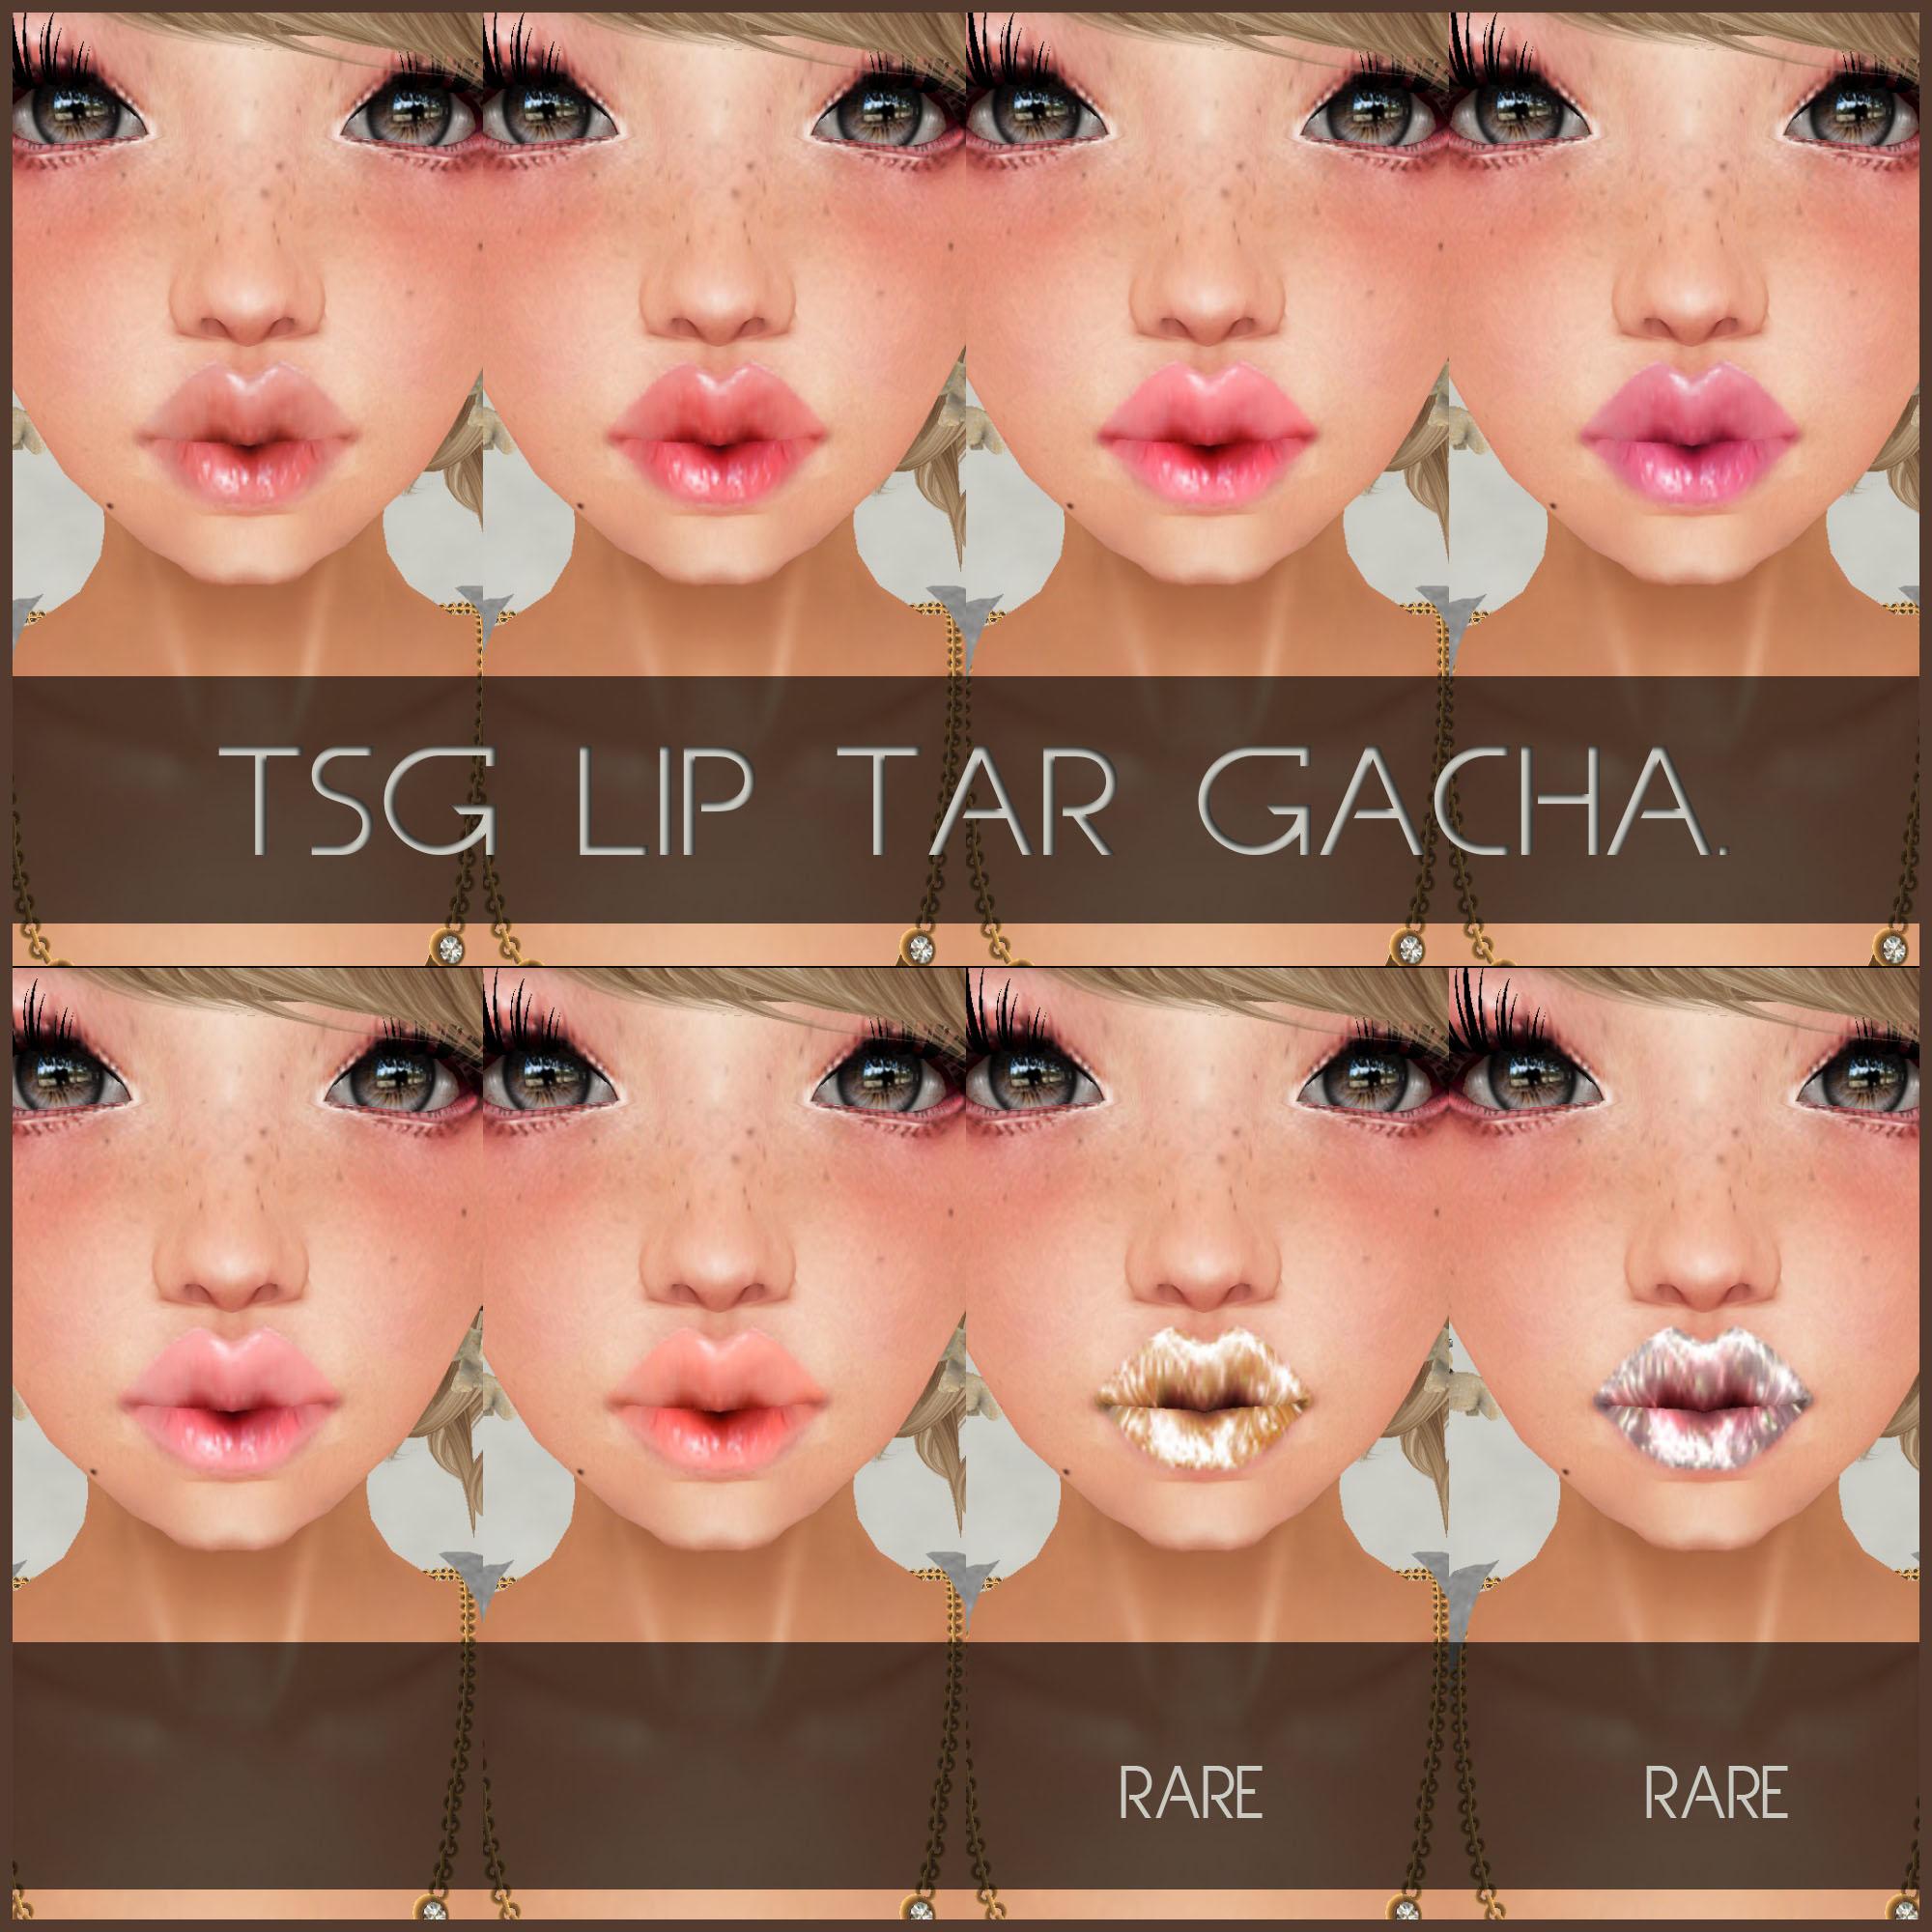 .tsg. Lip Tar Gacha